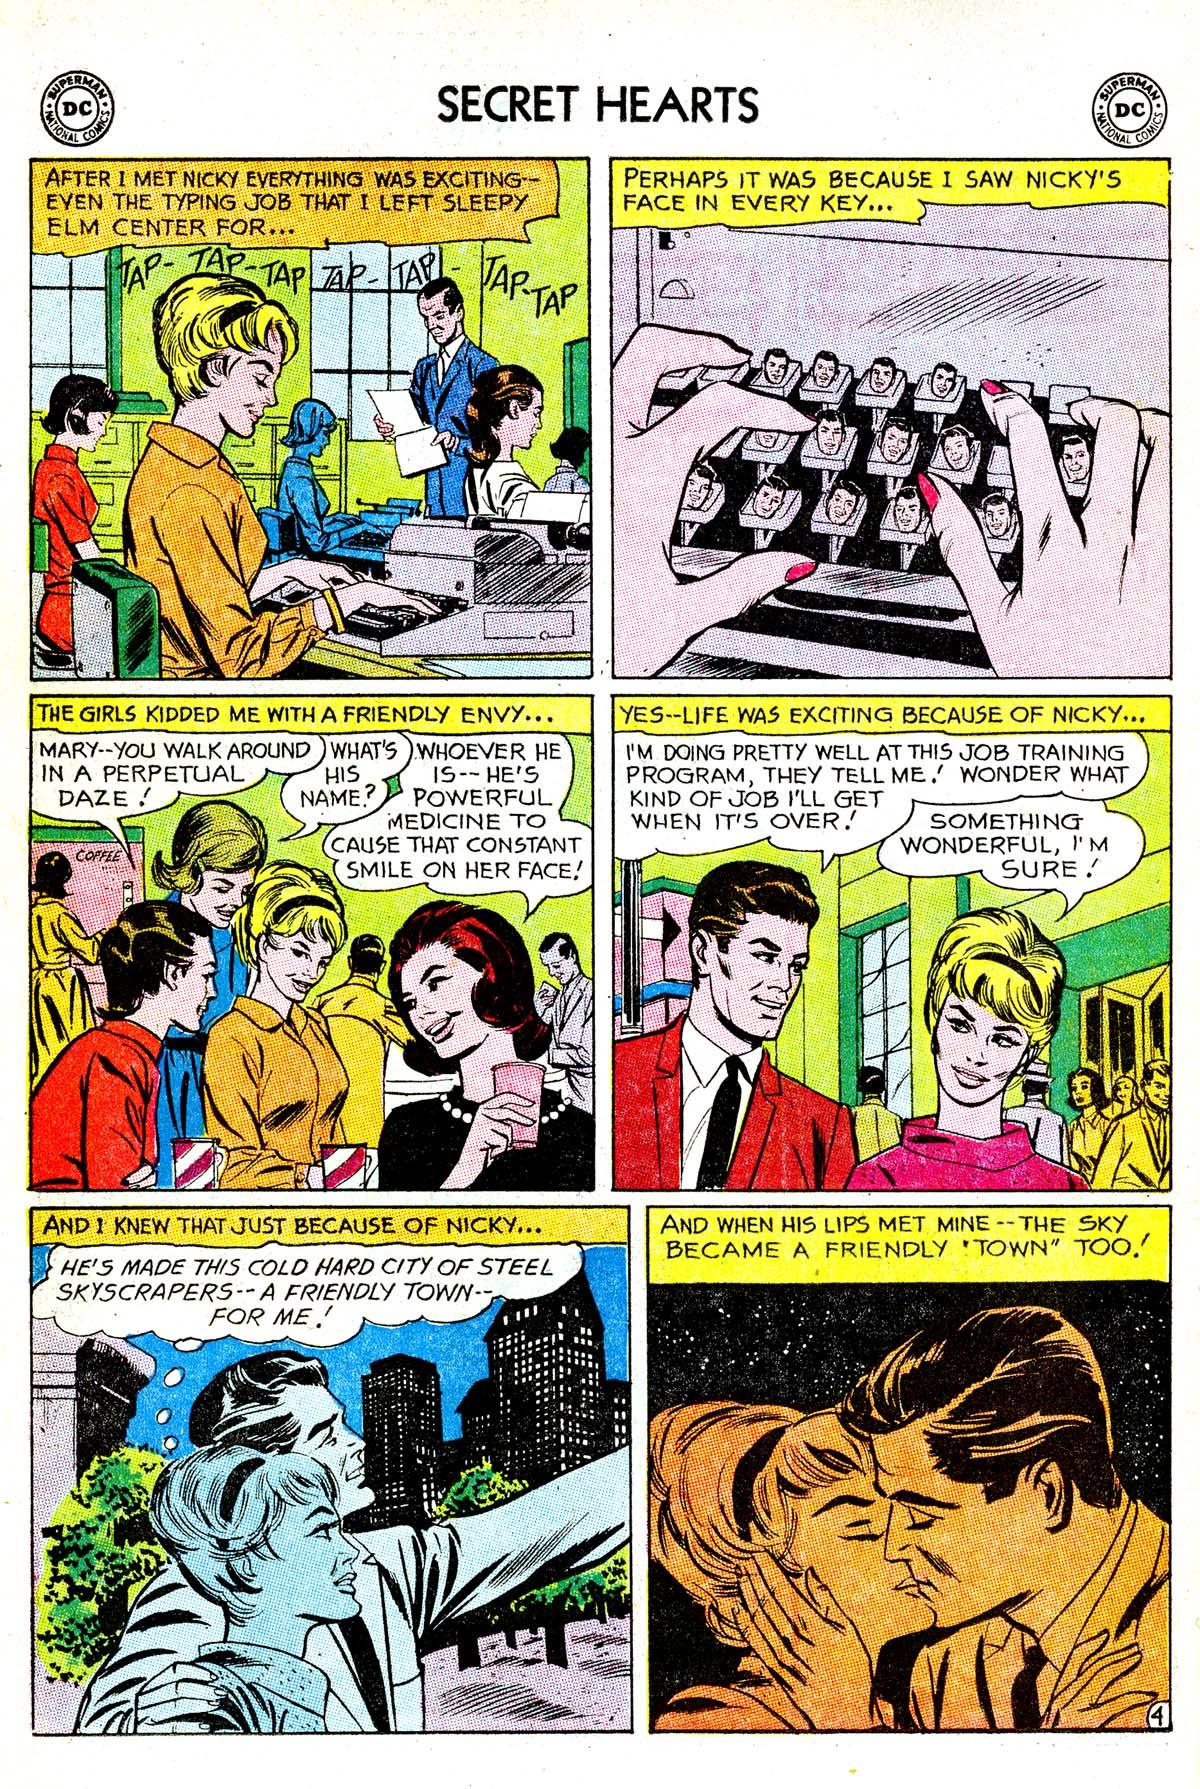 Read online Secret Hearts comic -  Issue #85 - 6